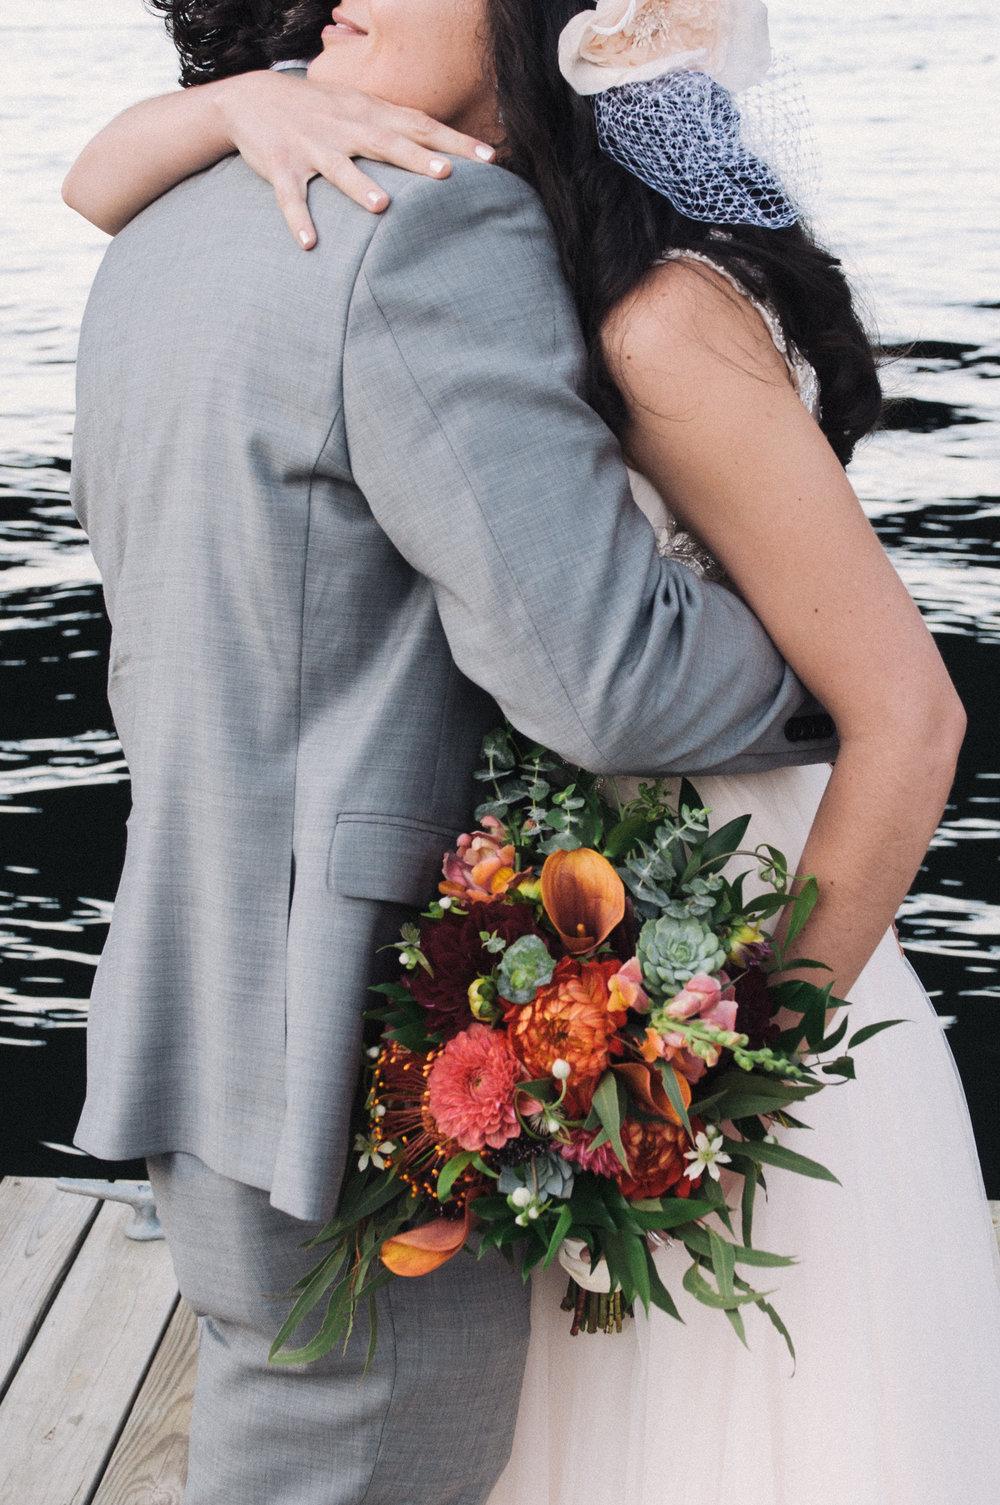 Weddings_BradRaquel_©meghanireland2016_38.jpg